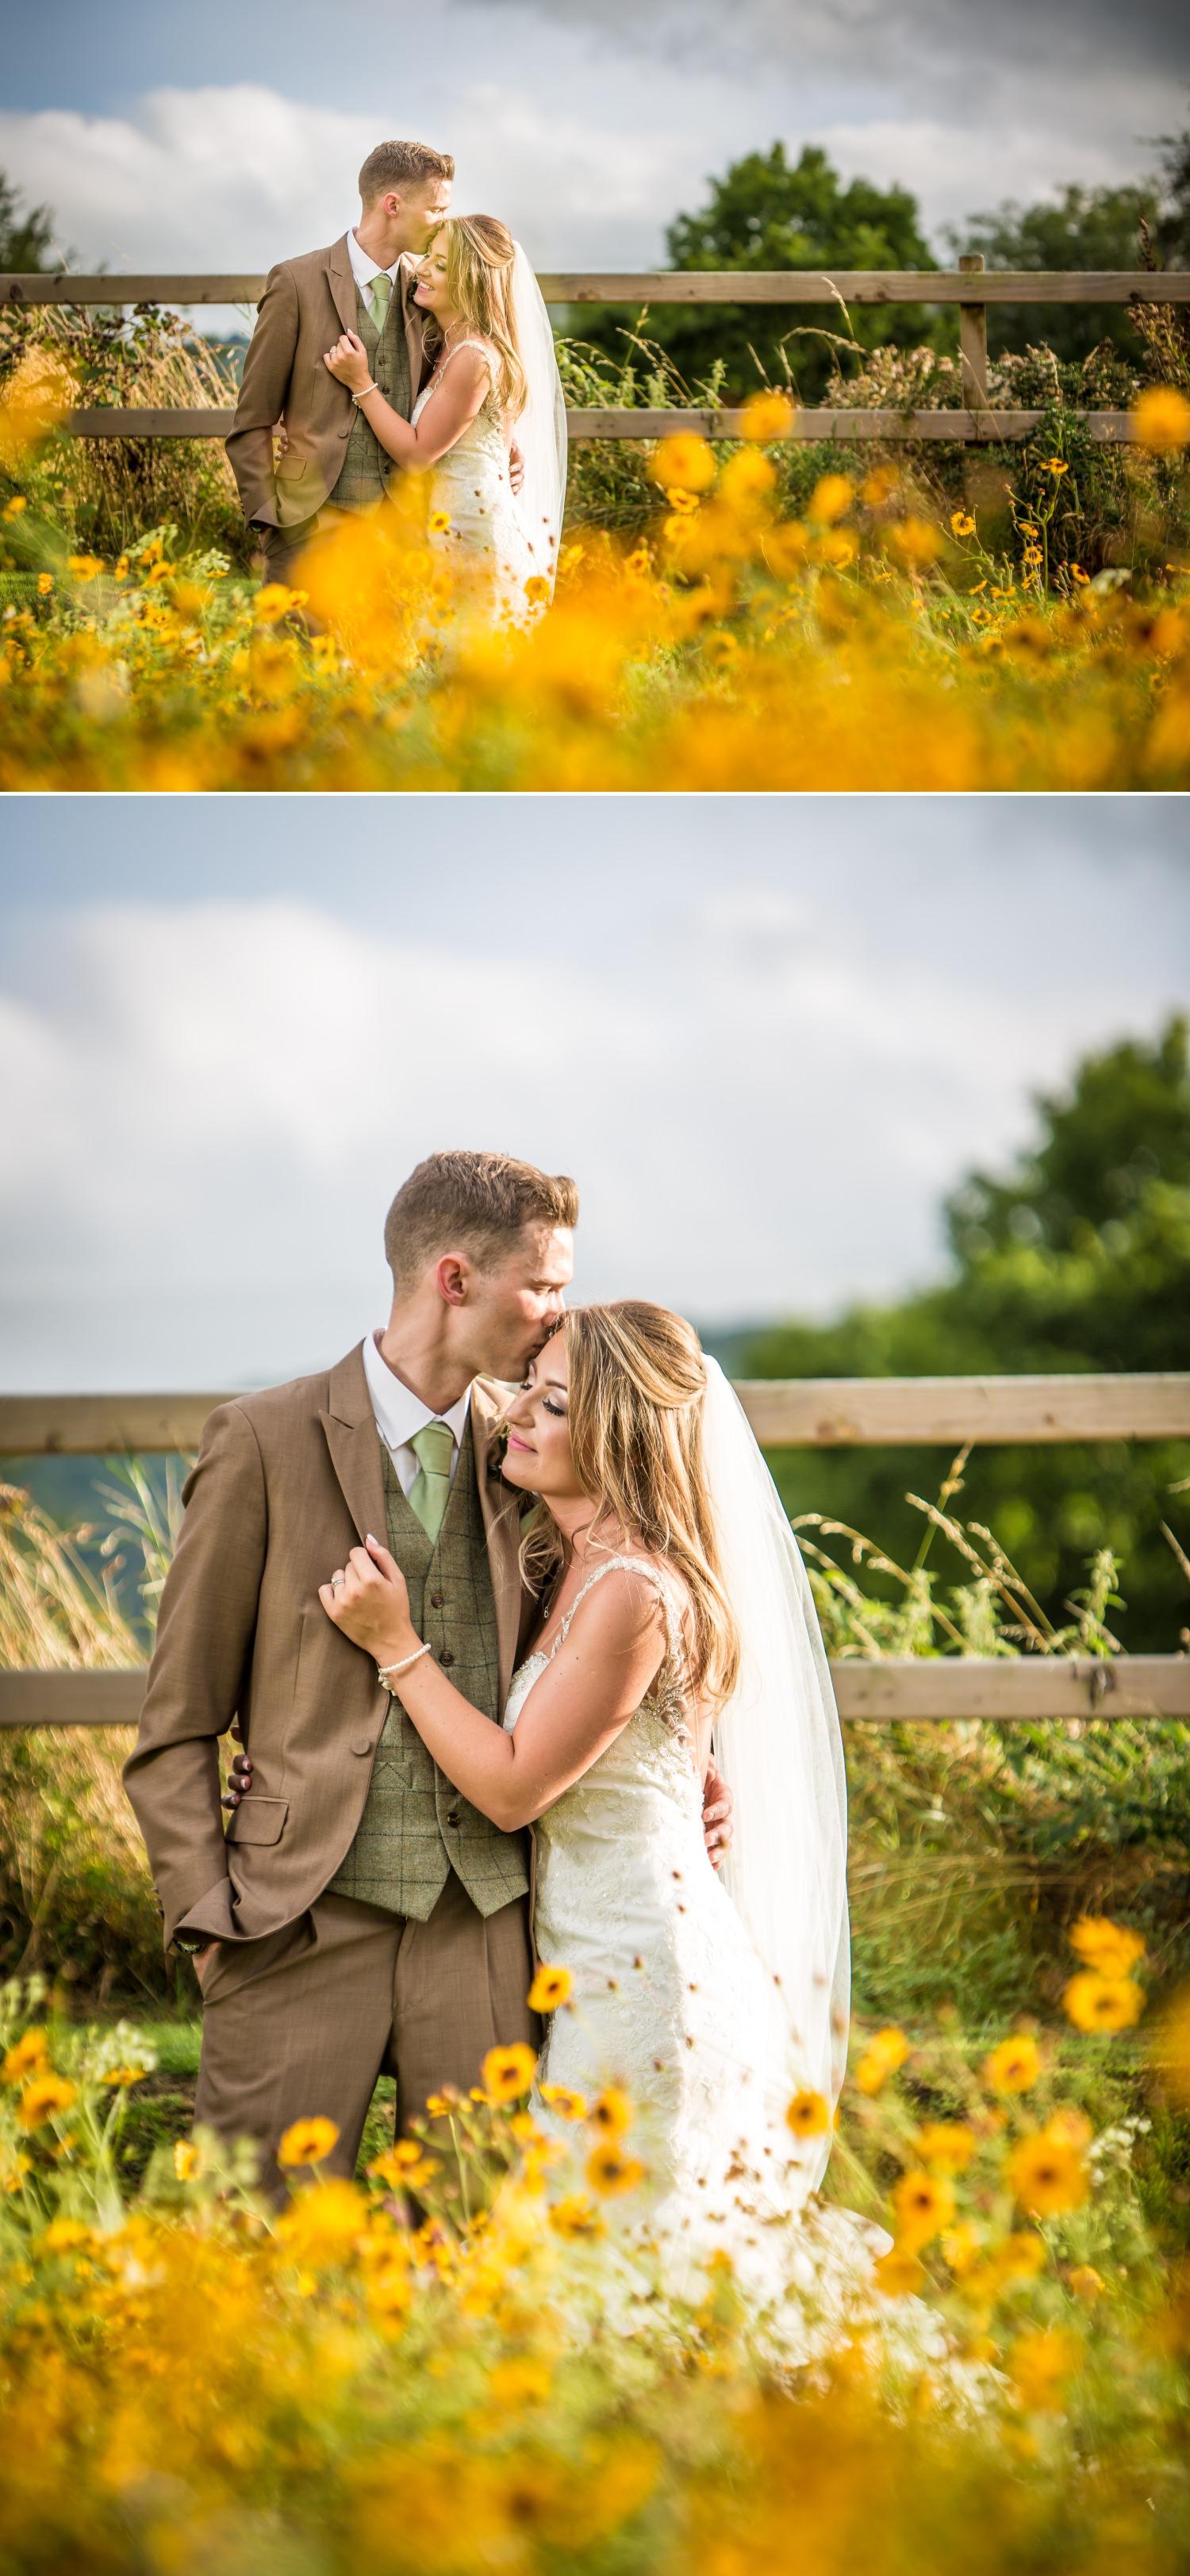 Wedding photography couple weddng shots at Tower Hill Barns, North Wales